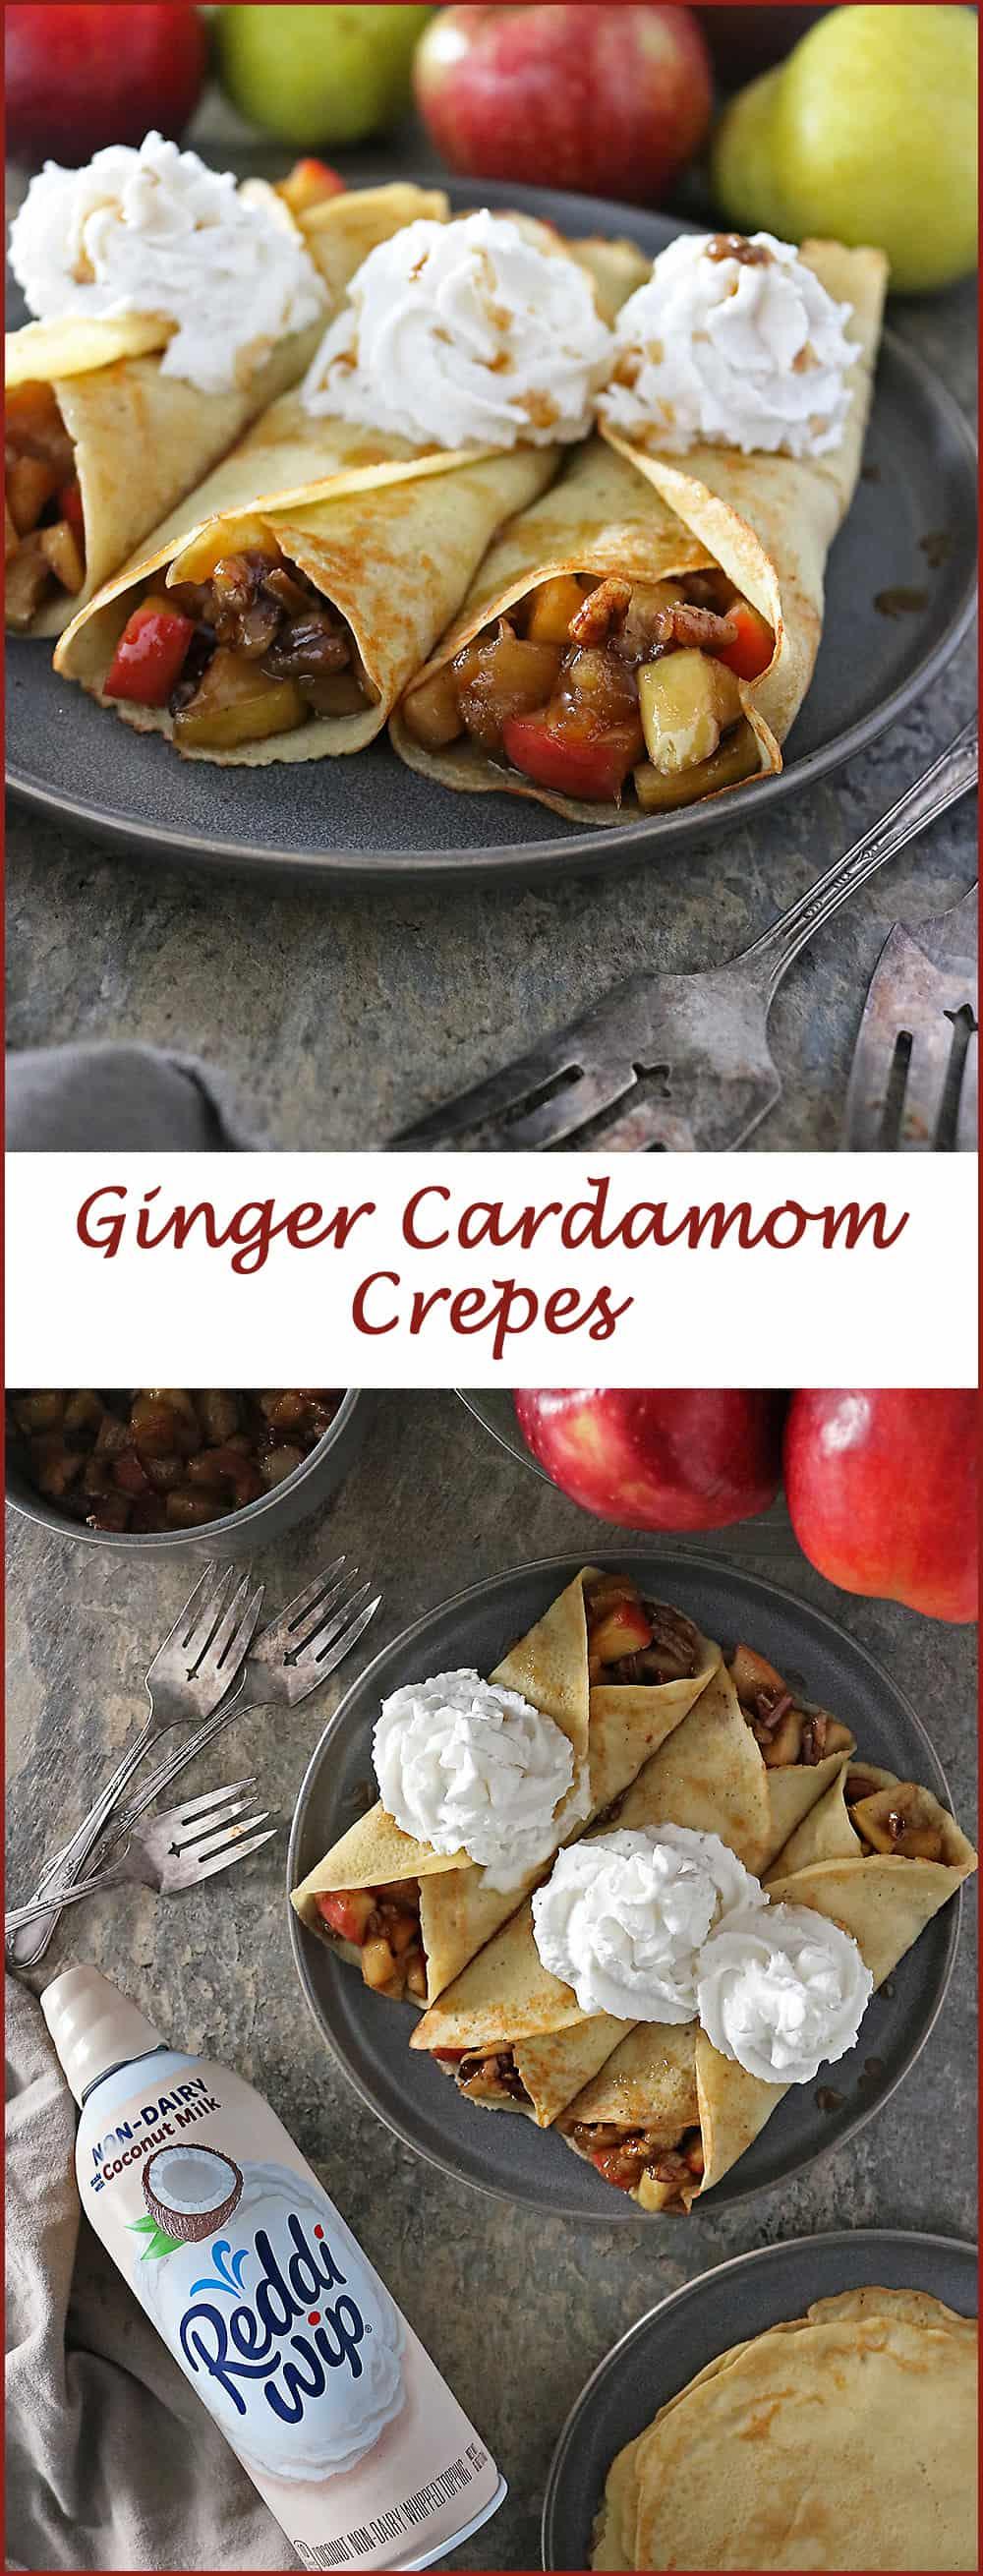 Ginger Cardamom Crepes